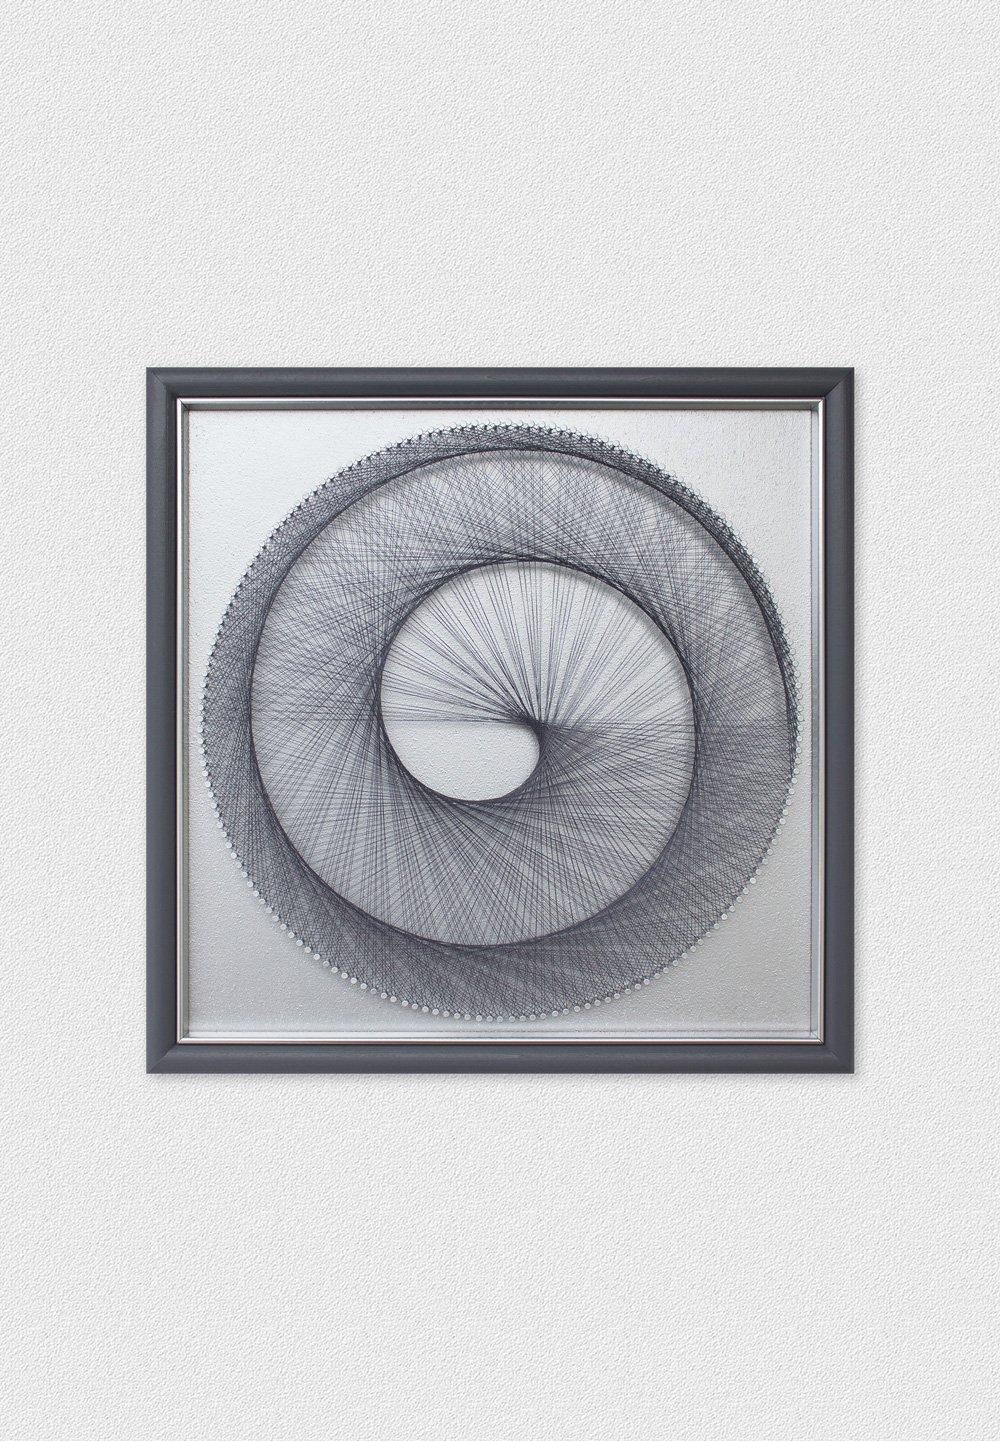 Geometry Art Spiral